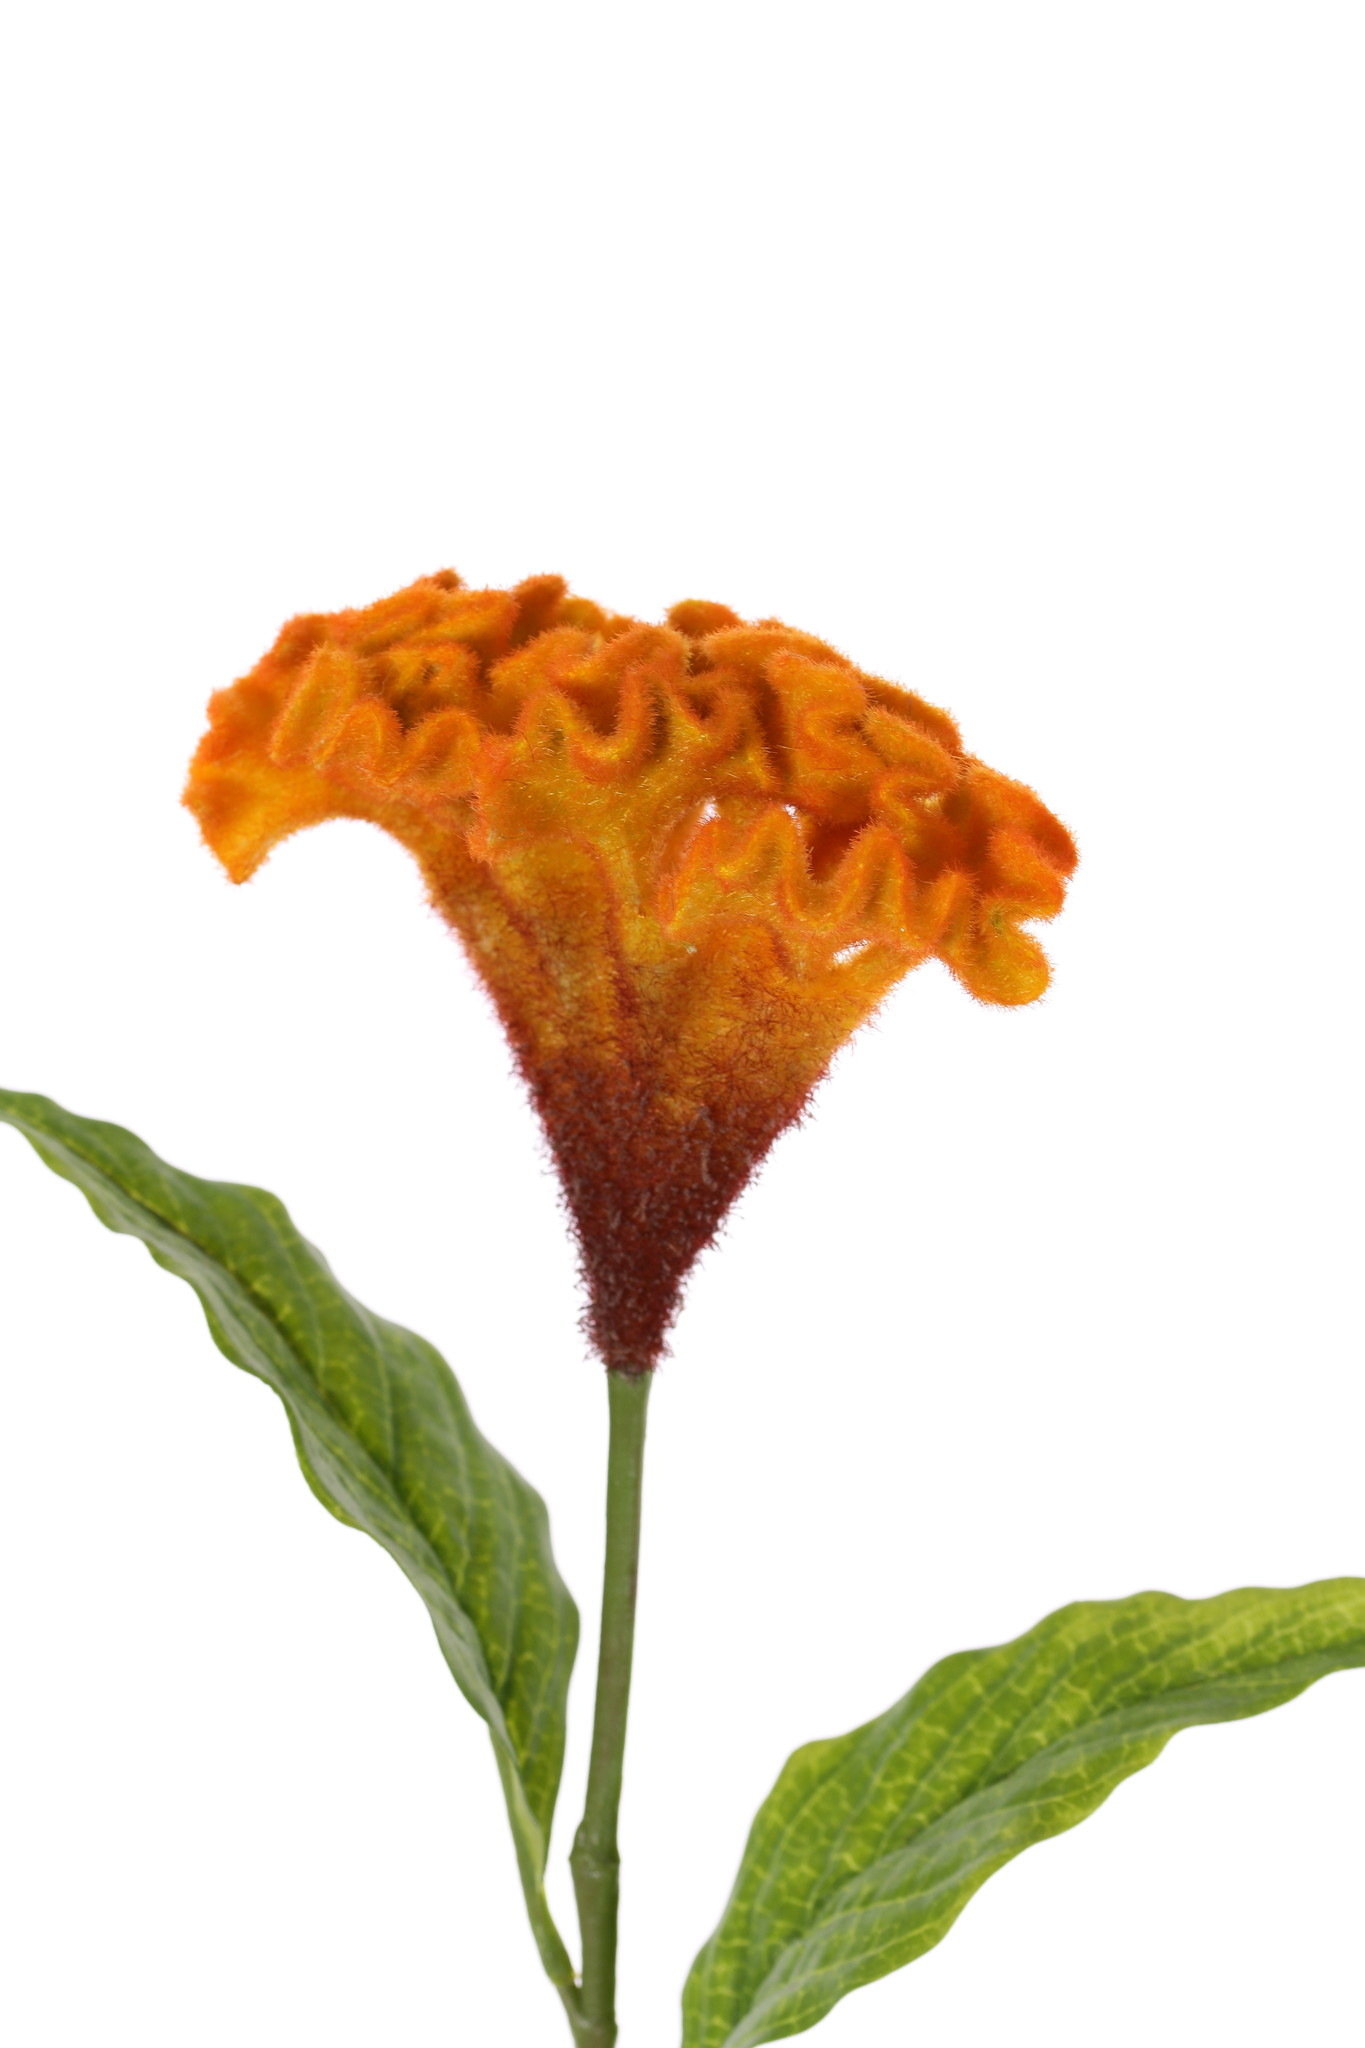 Celosia argentea 'Cristata' (plumed cockscomb), Ø 13cm & 2 lvs., 60cm